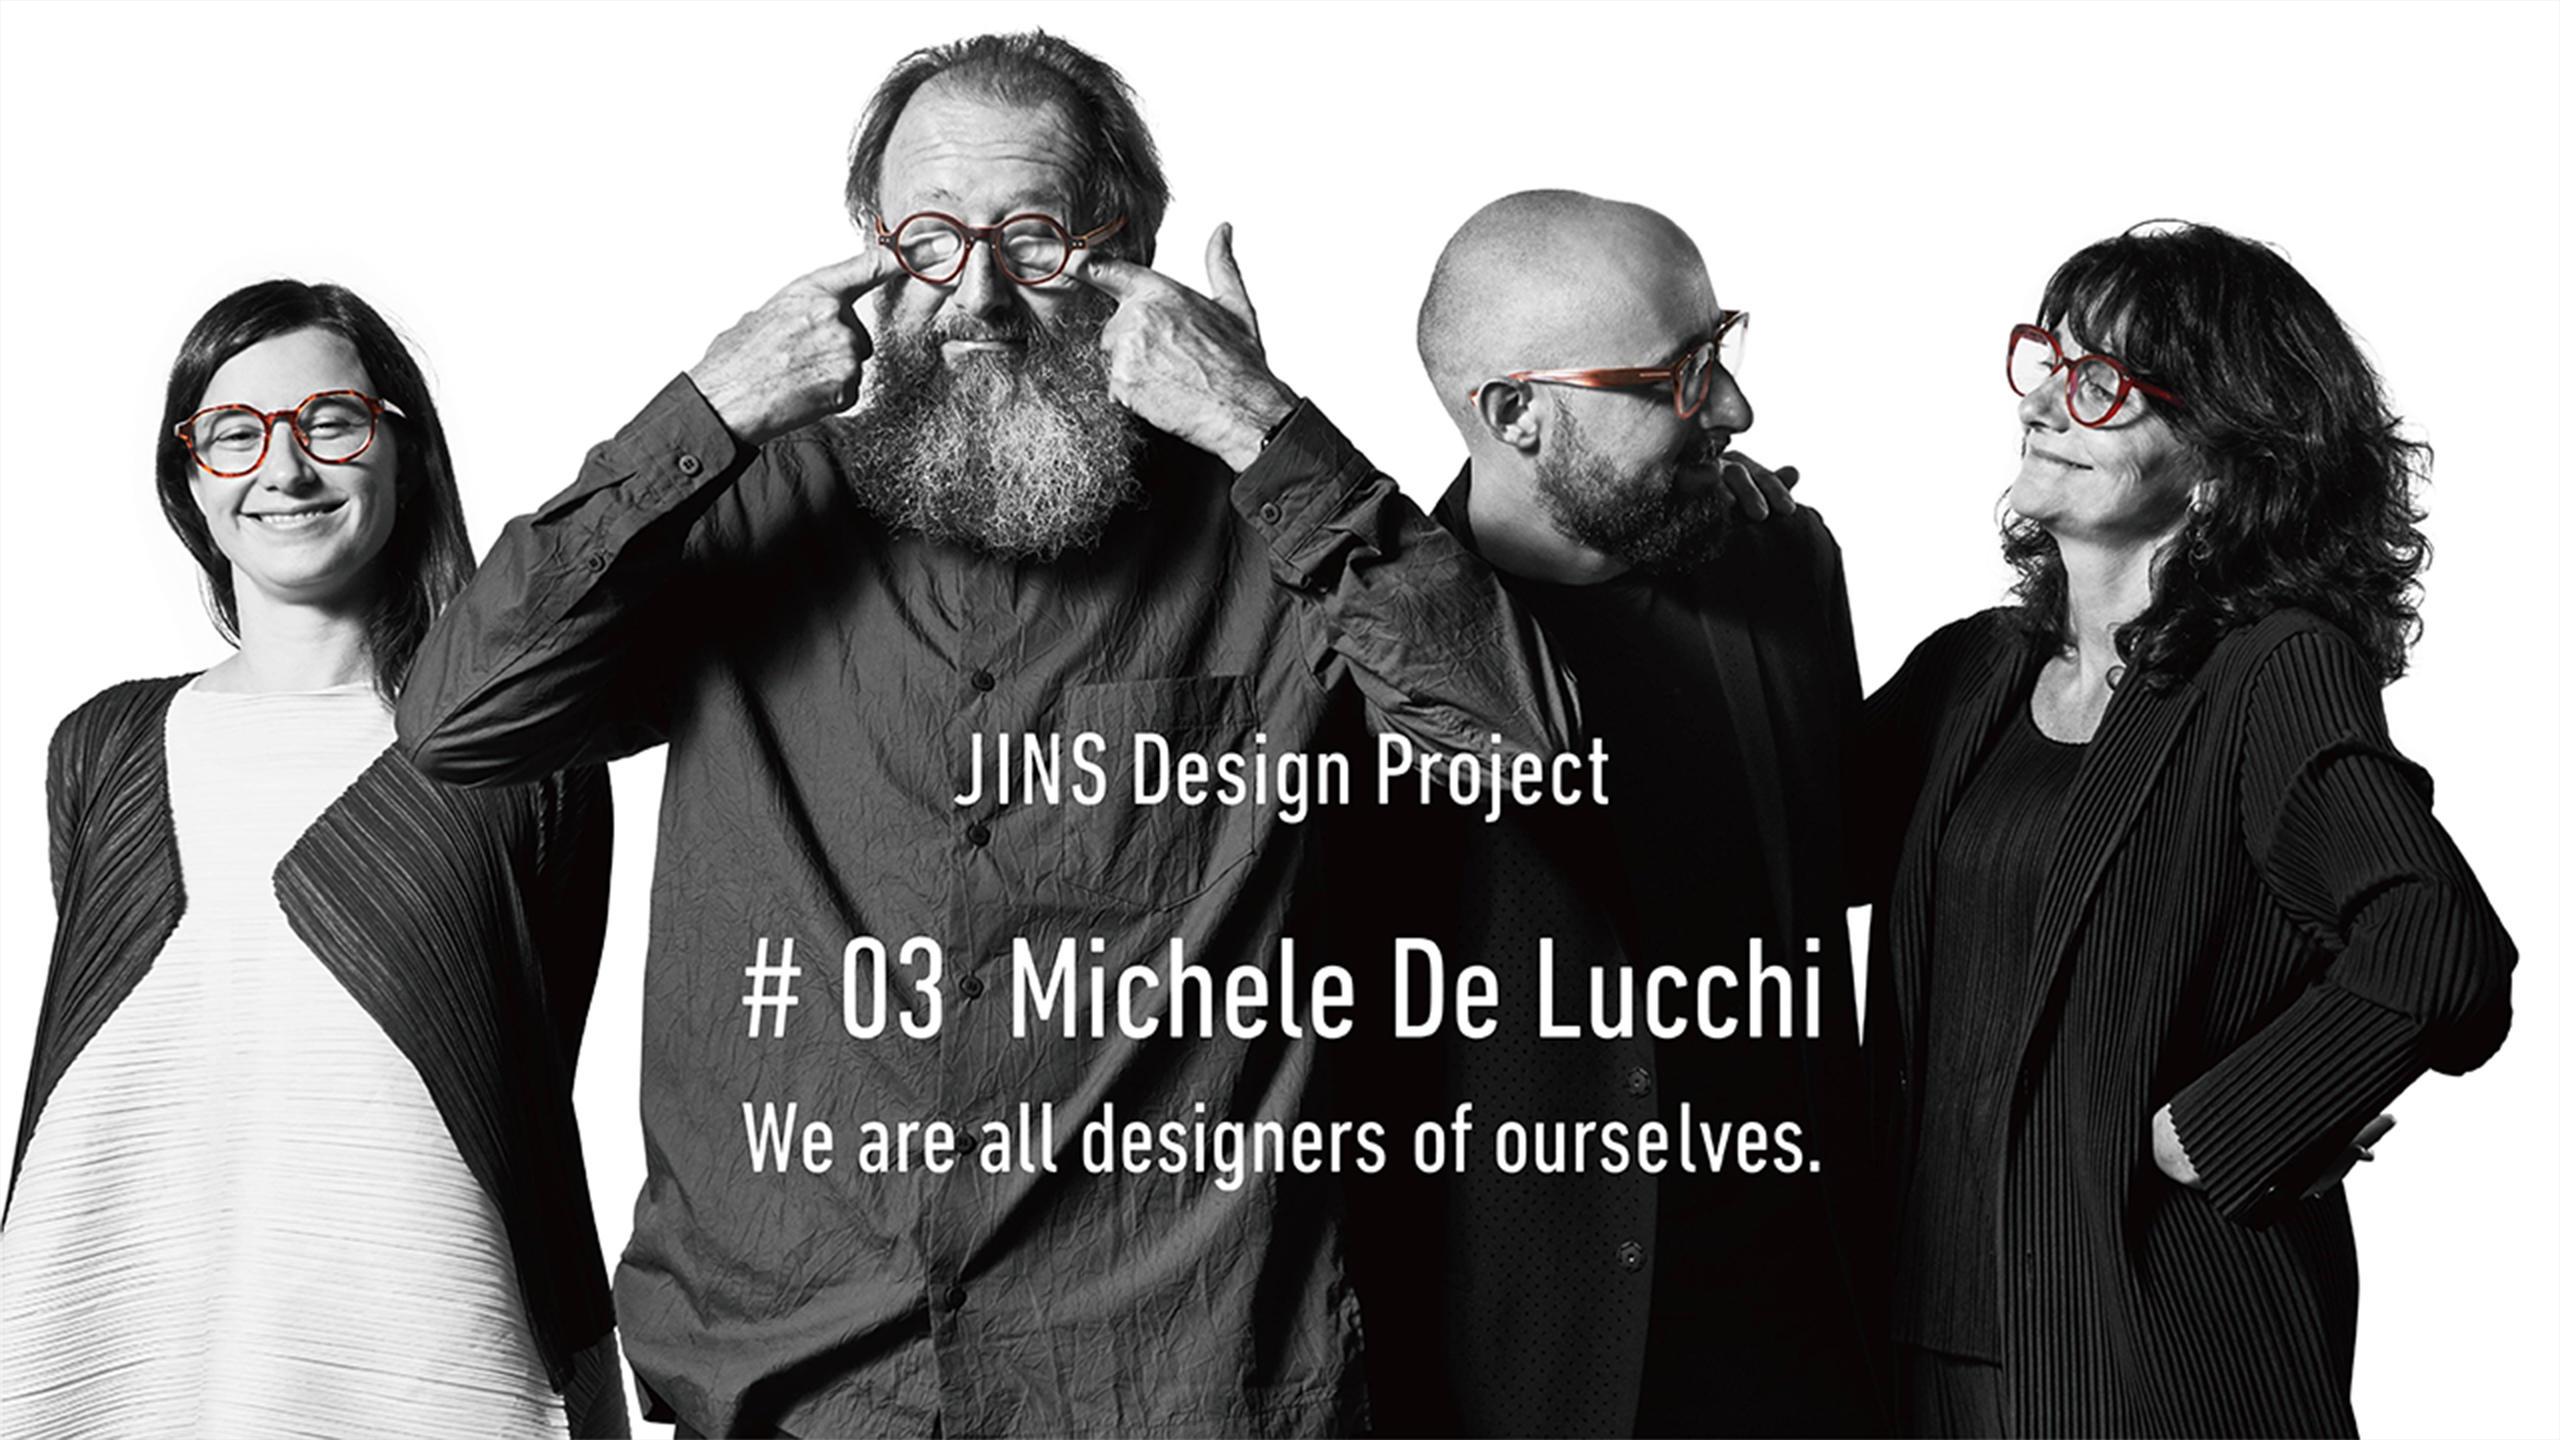 JINS Design Project第三弾ミケーレ・デ・ルッキ モデル